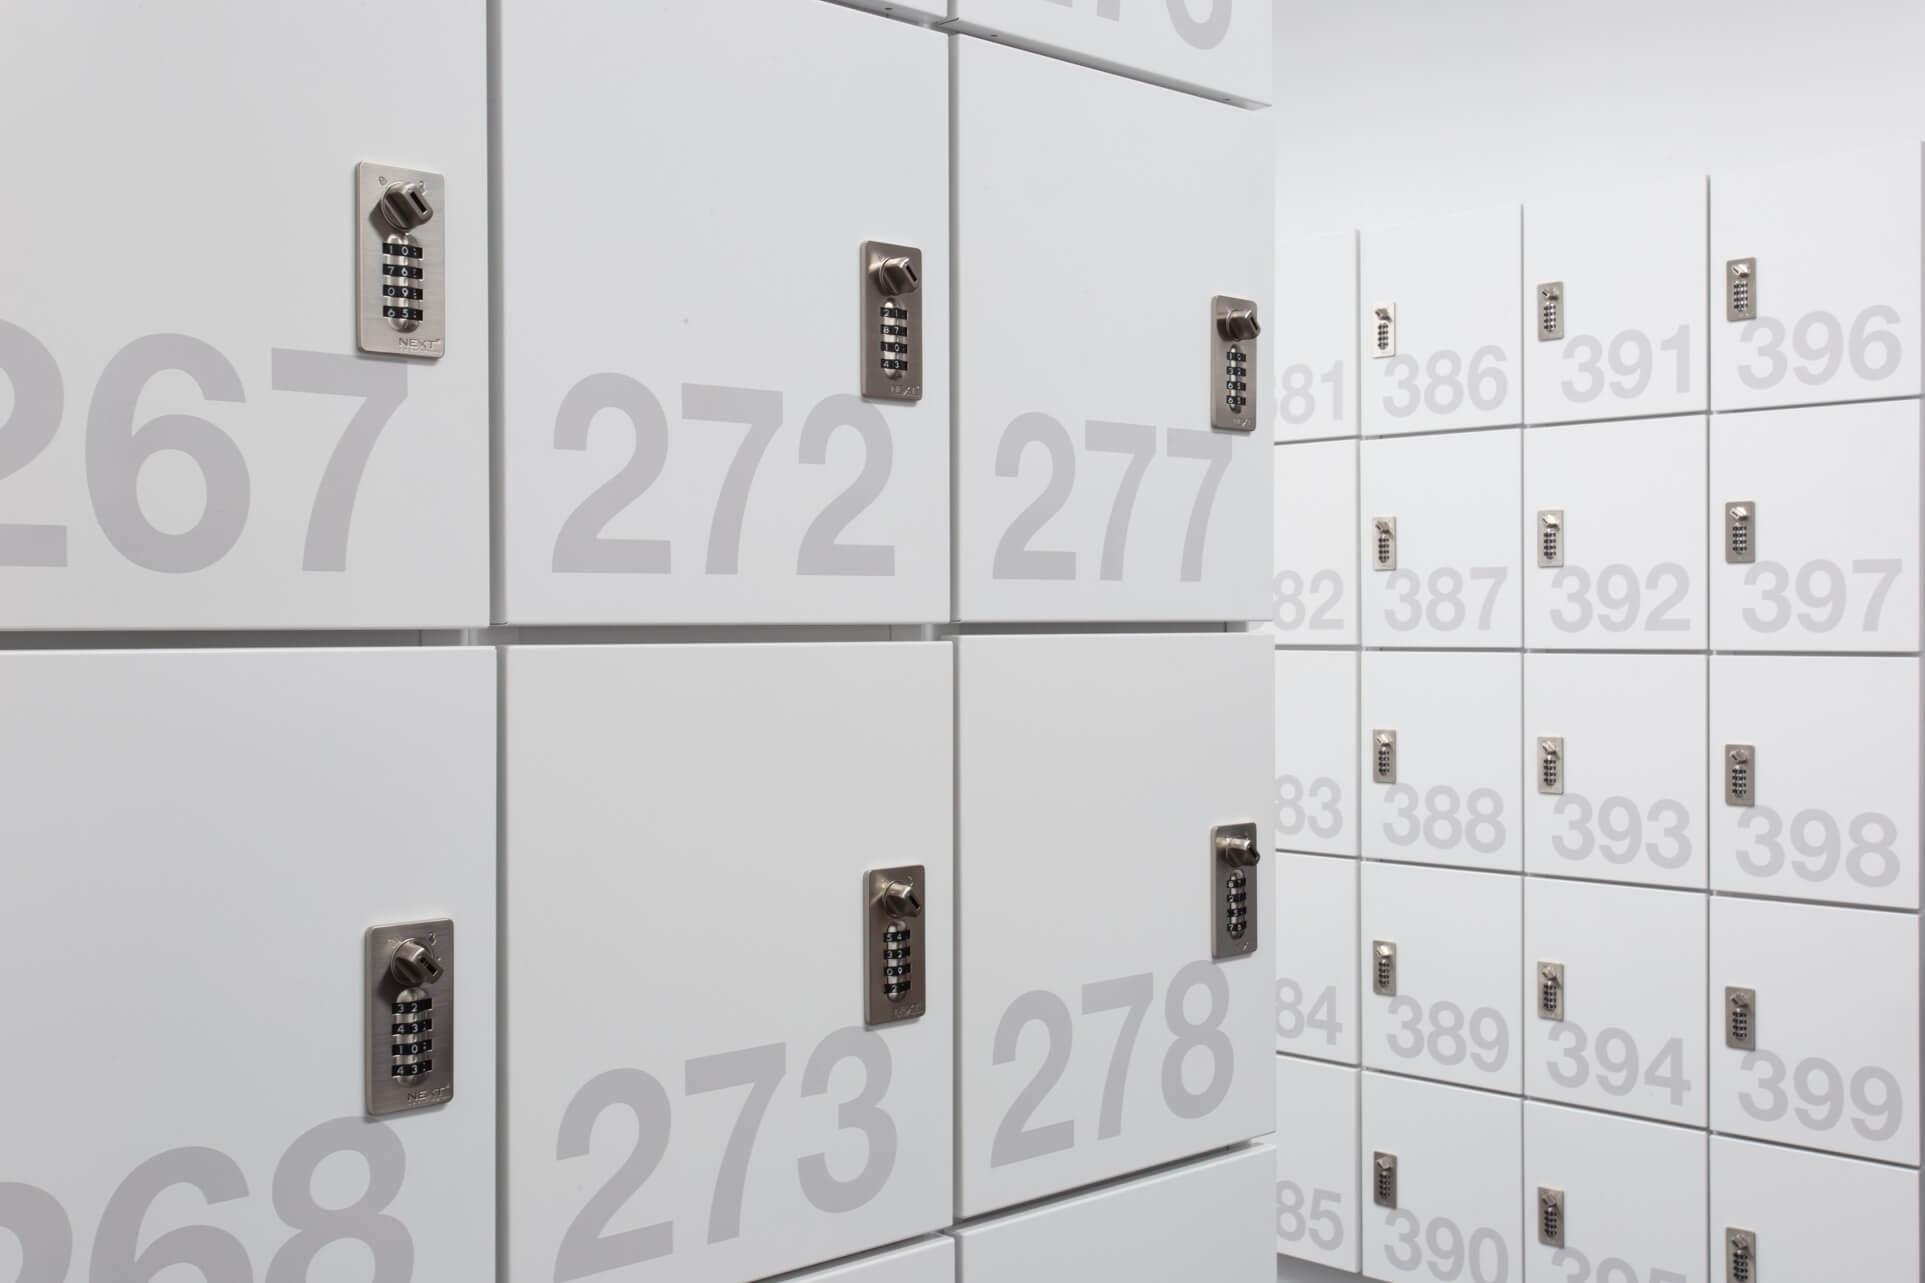 Day Use Lockers